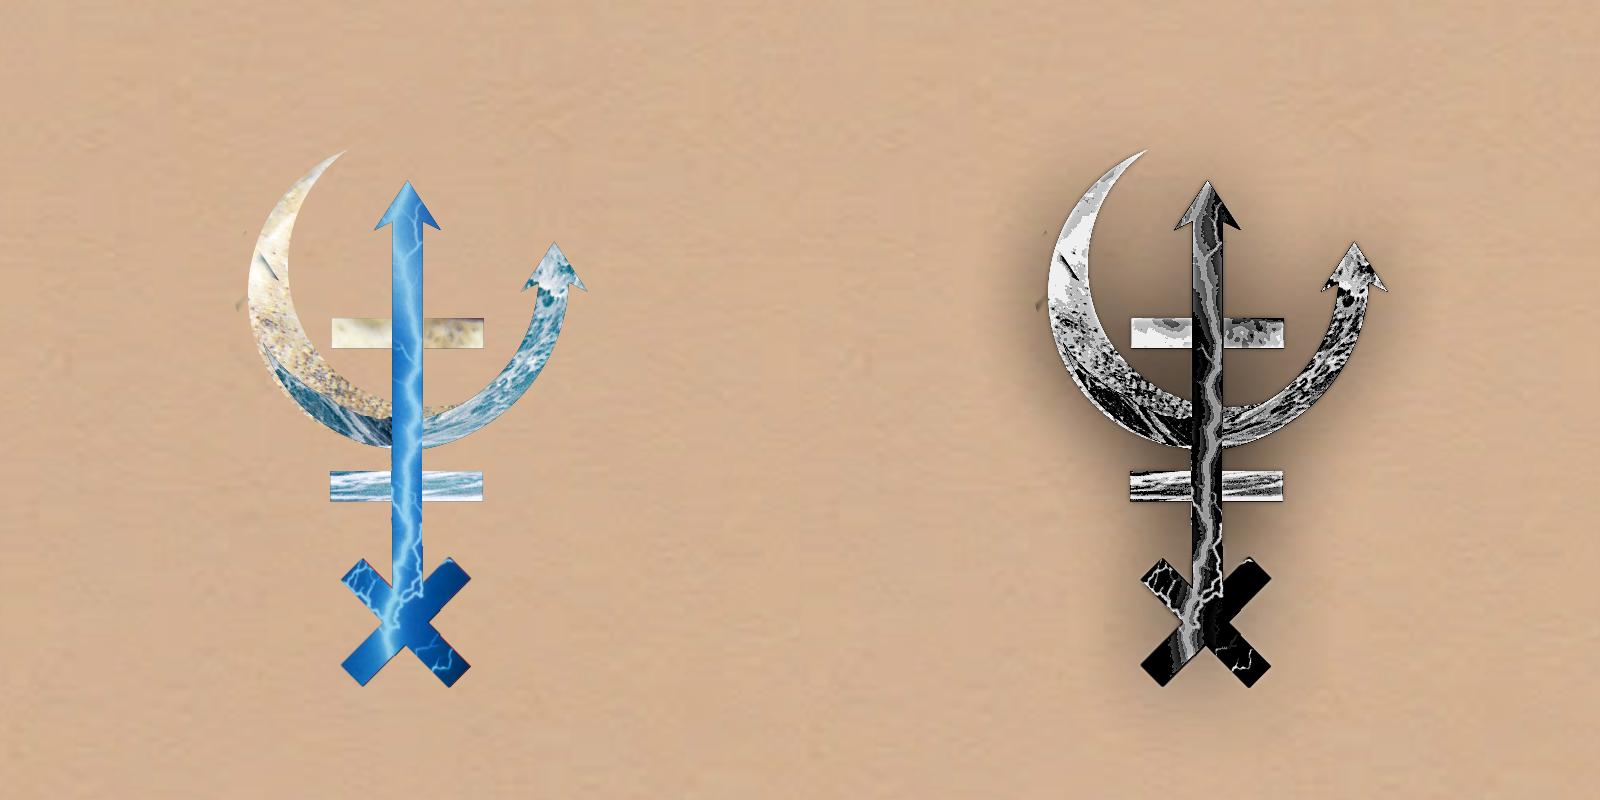 Combined Hades, Poseidon, Zeus Symbols | Nerdy | Pinterest ...